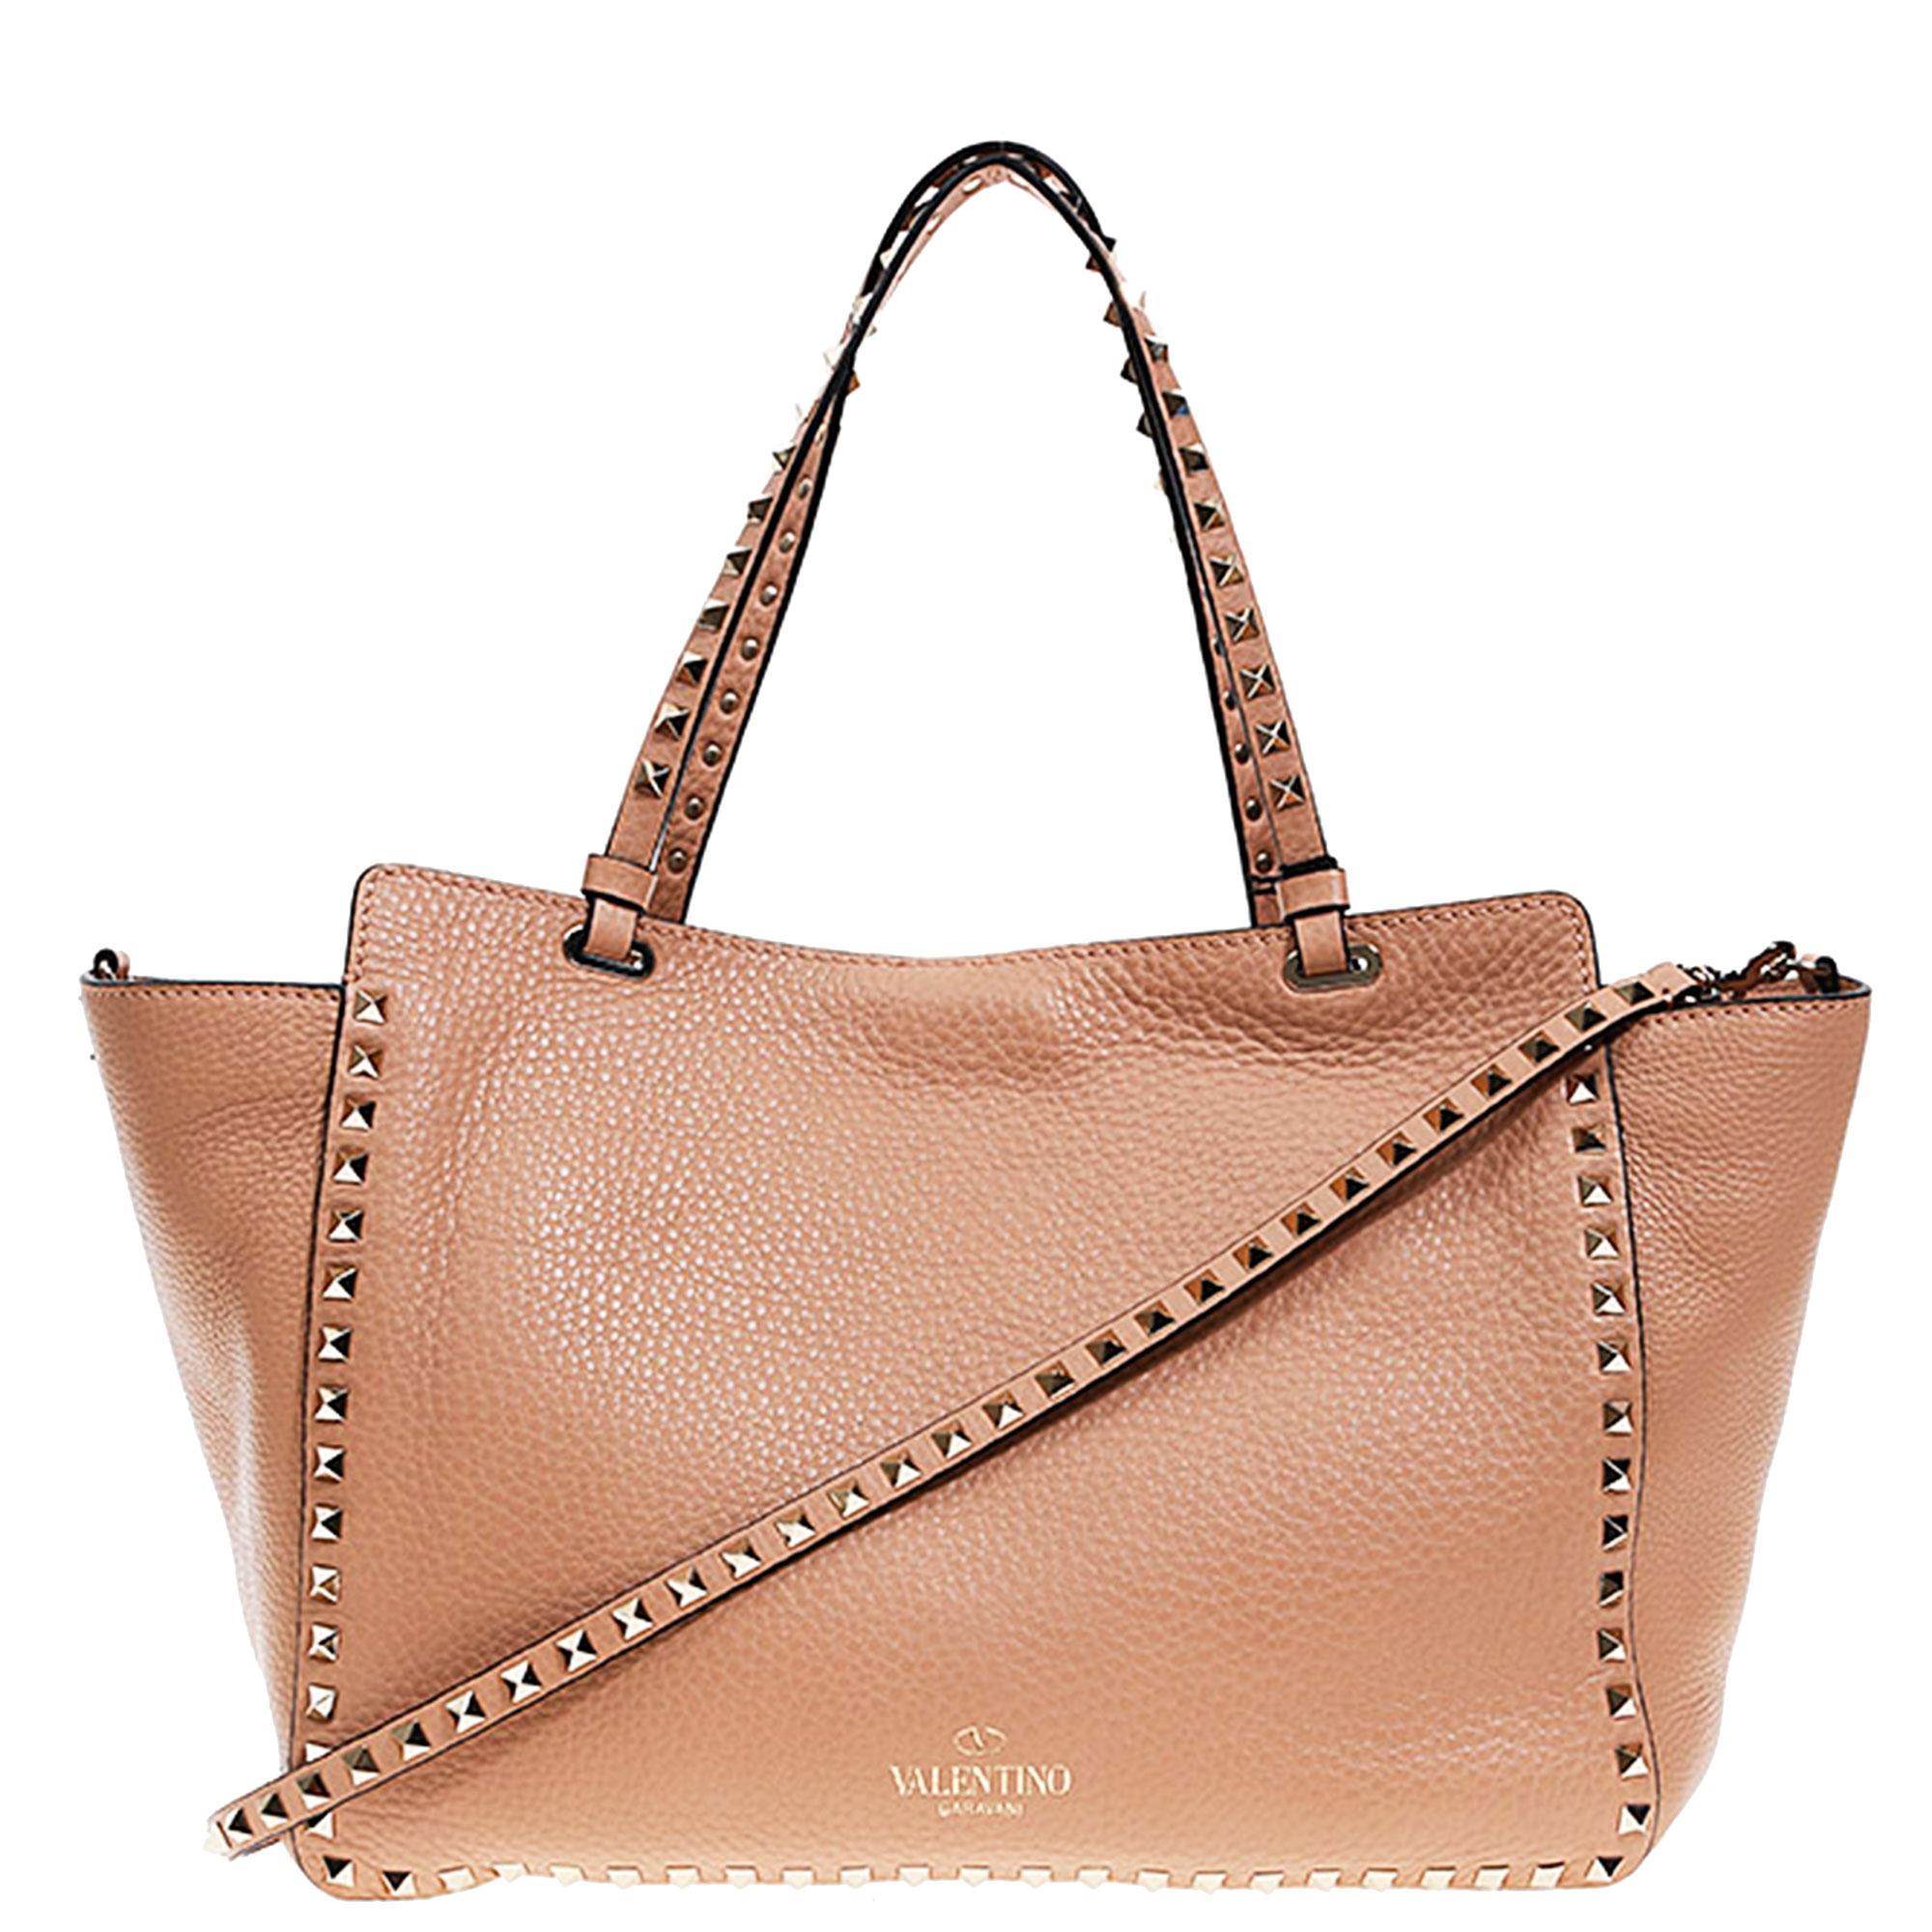 69b2c8b95320 Lyst - Valentino Rockstud Shopping Bag in Natural